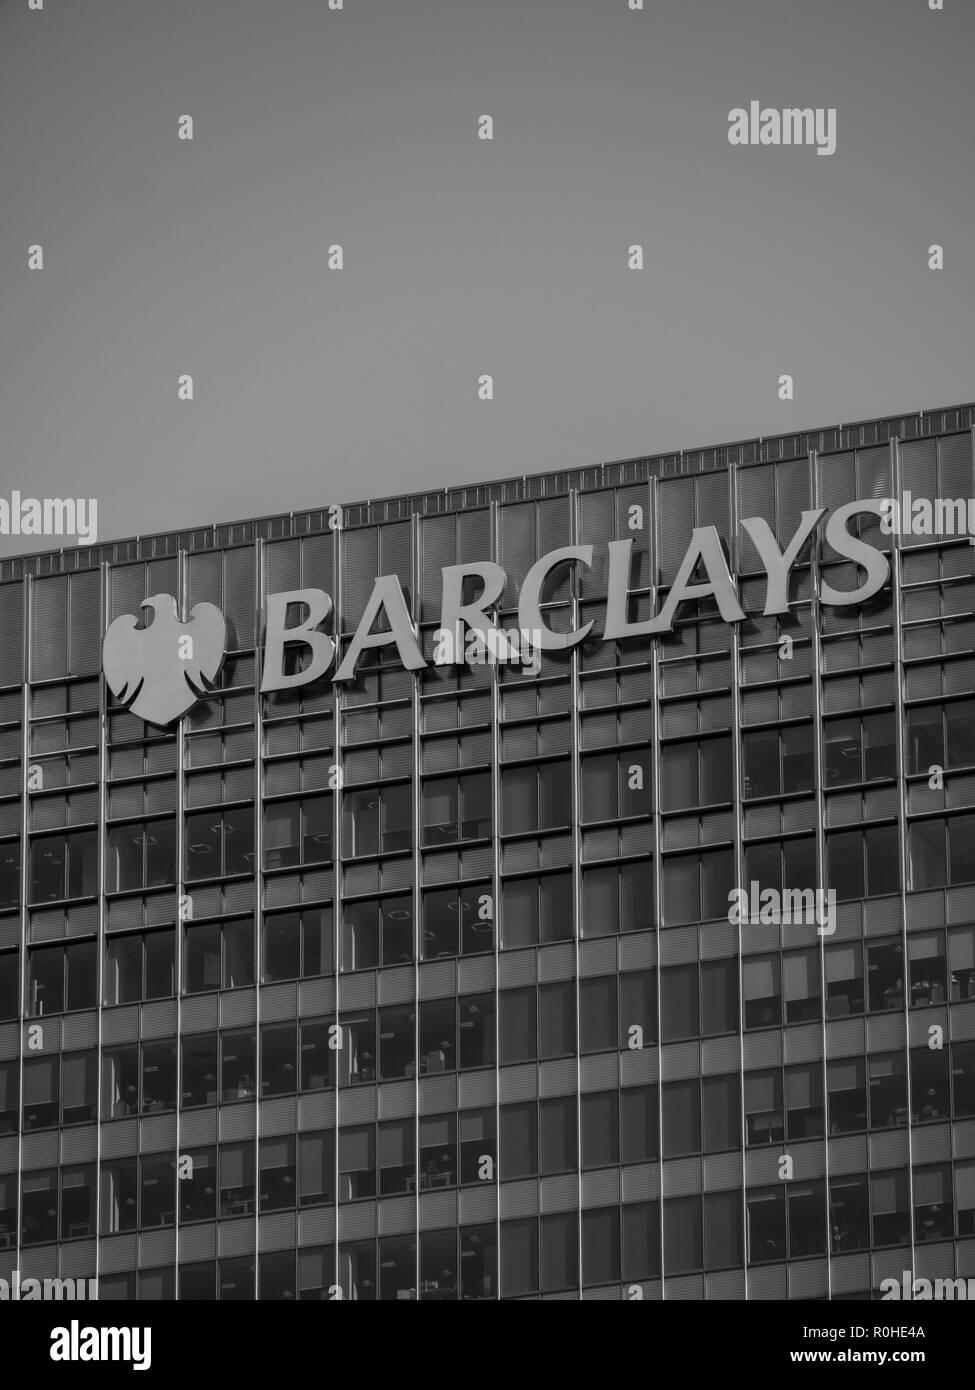 Barclays Building, Canary Wharf, London, Docklands, London, England, UK, GB. - Stock Image